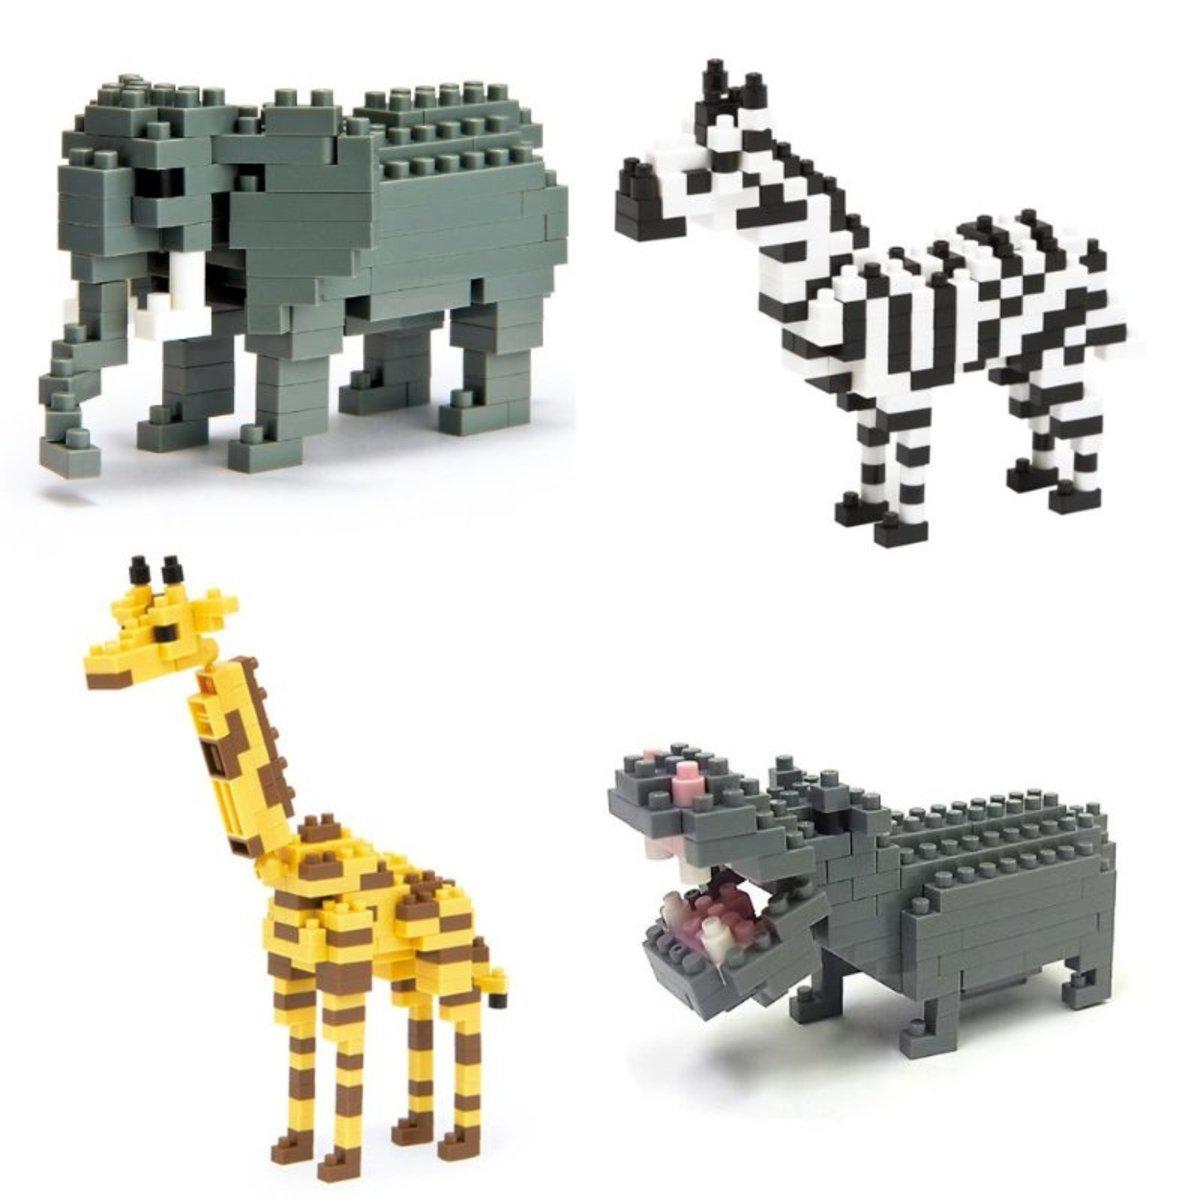 Nanoblock Animals Set: Elephant, Hippo, Giraffe & Zebra